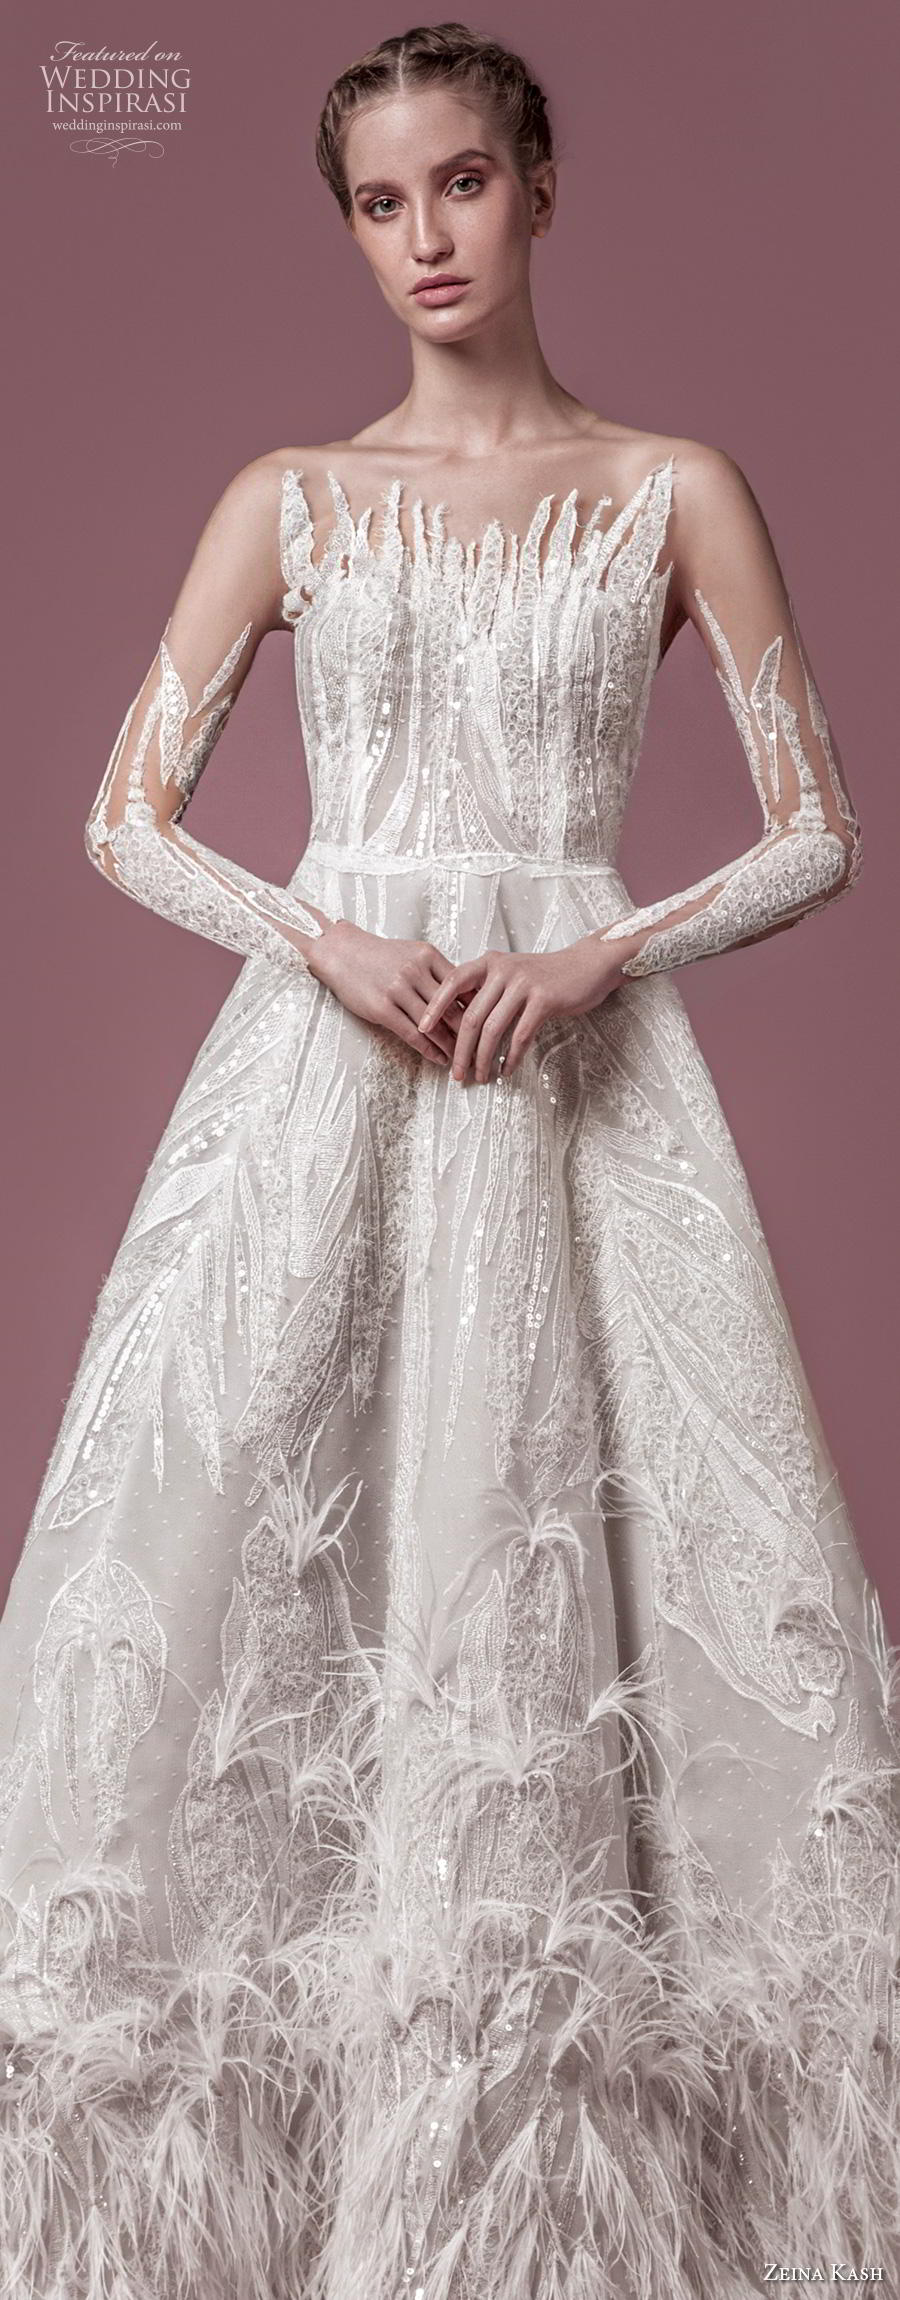 zeina kash 2018 bridal long sleeves illusion jewel full embellishment glitzy glamorous a  line wedding dress blackless open back chapel train (2) lv